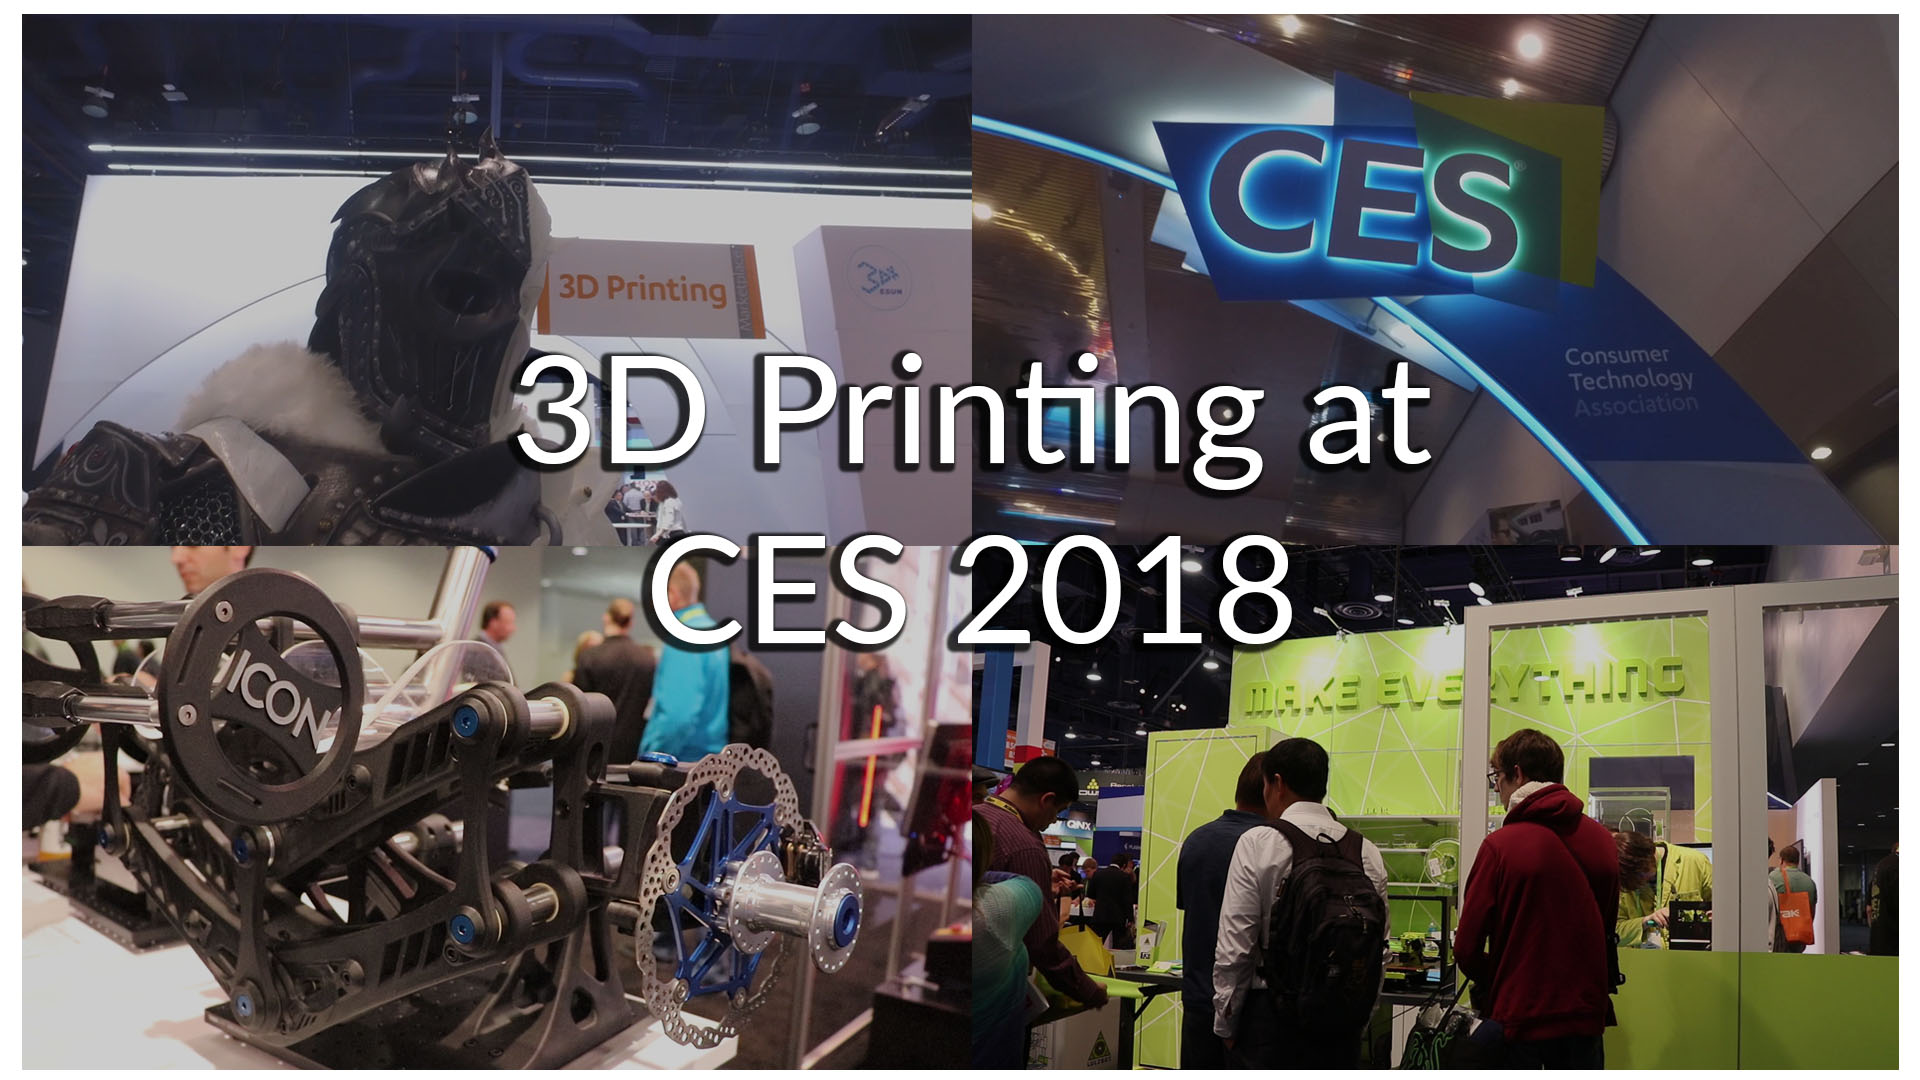 3D Printing CES 2018